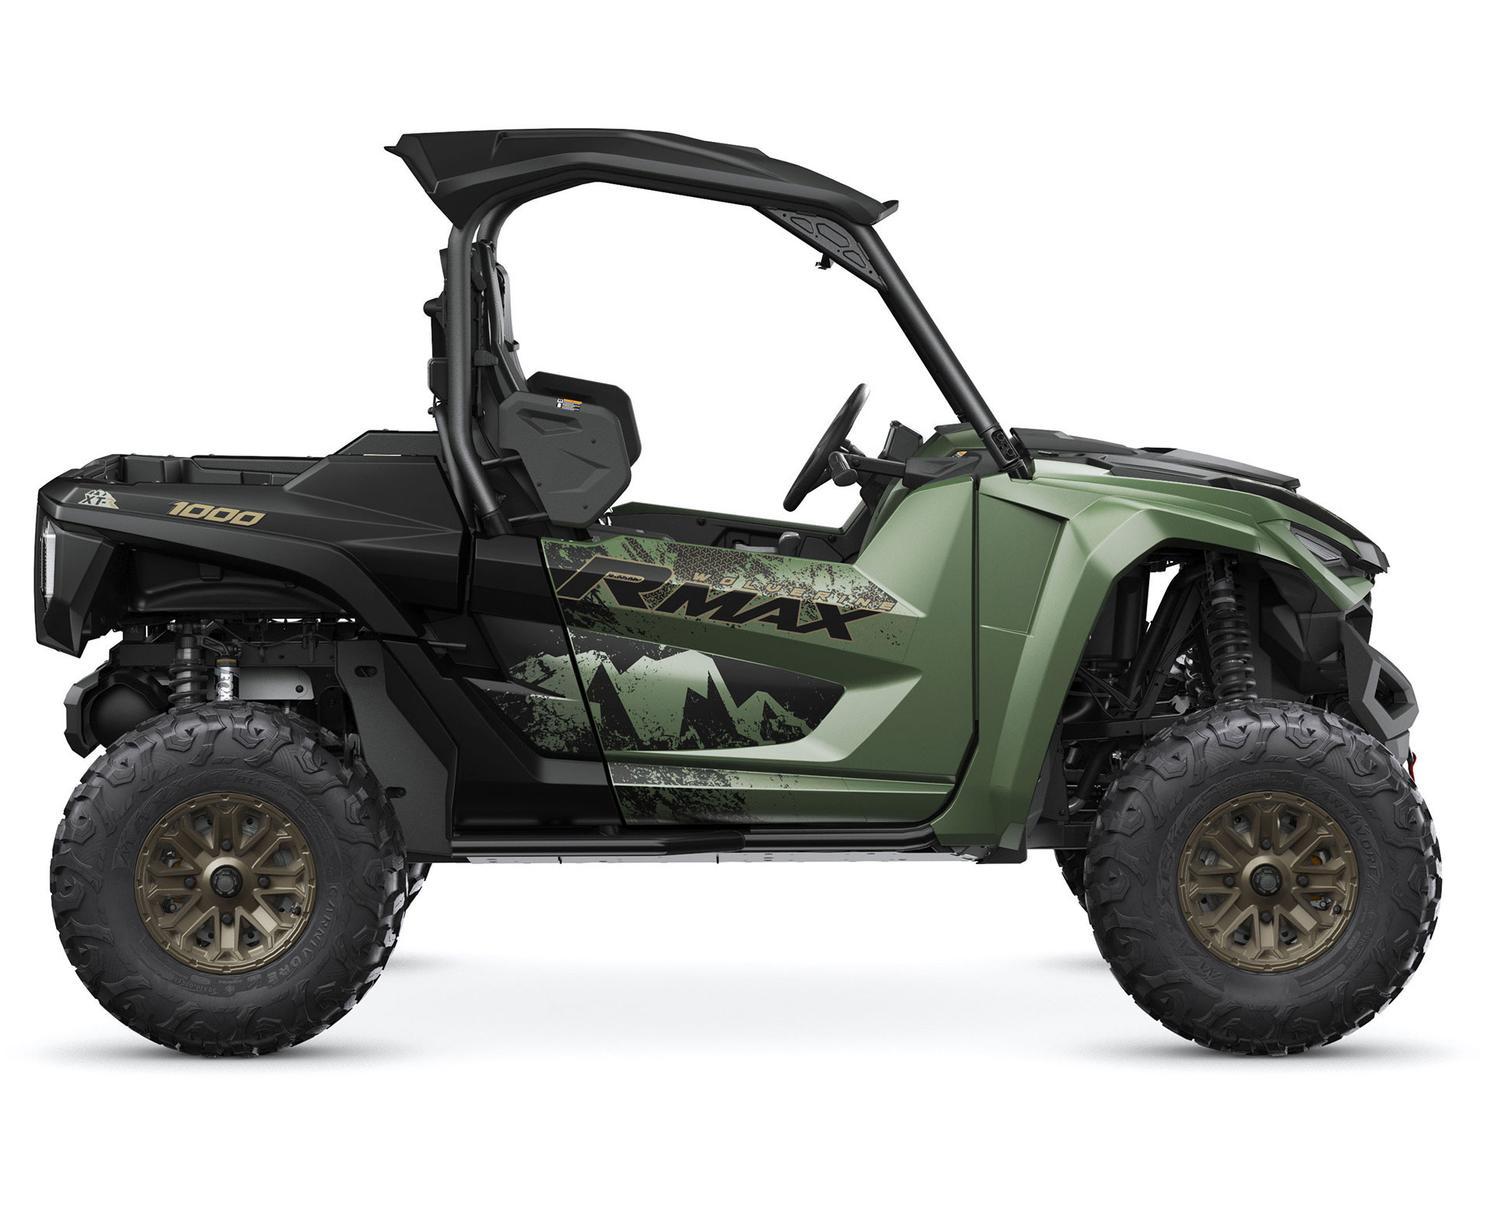 2021 Yamaha Wolverine RMAX2 1000 EPS SE